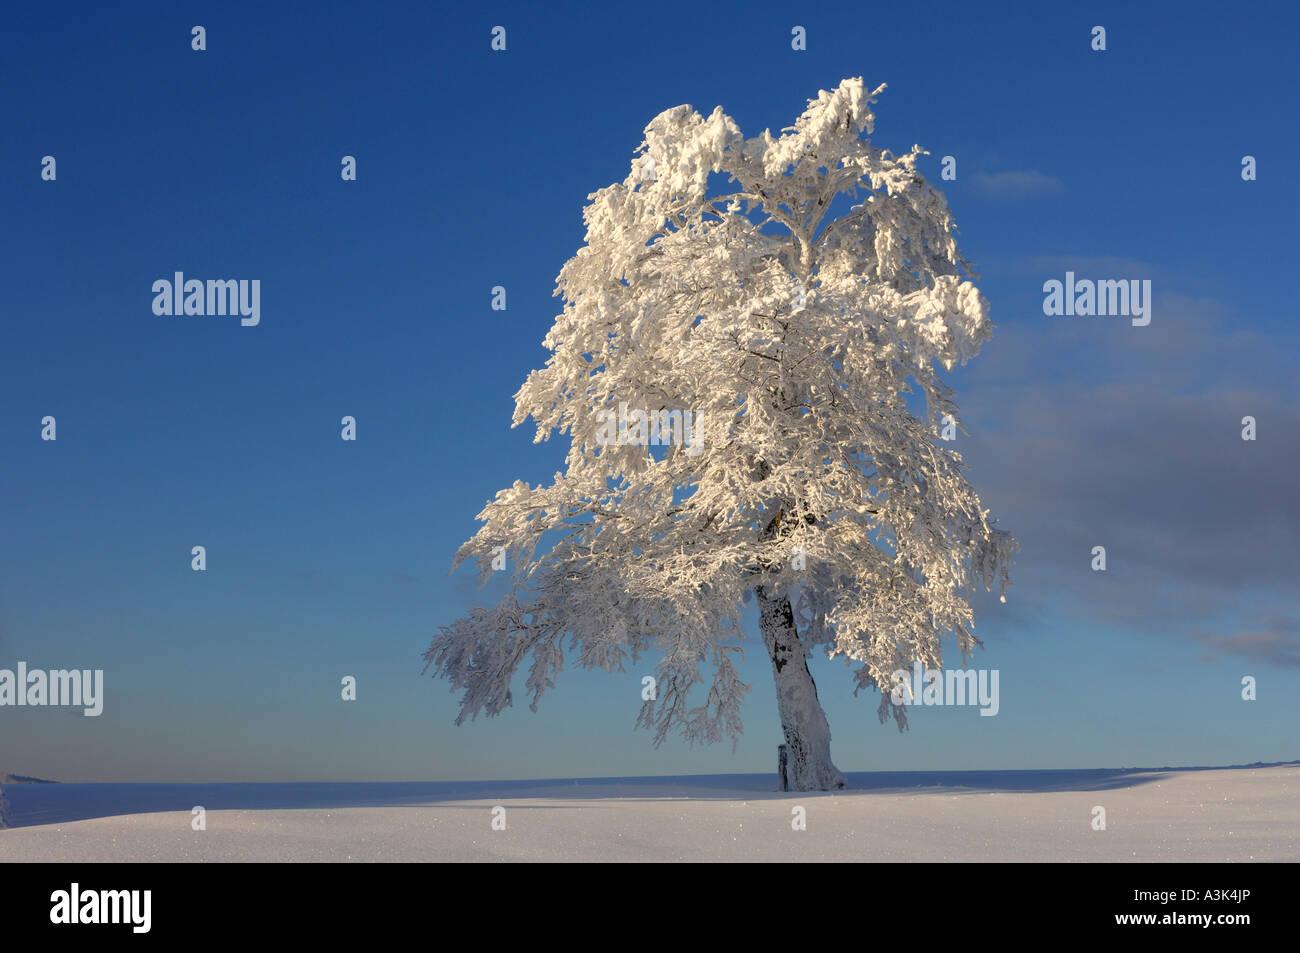 La neige a couvert Beech Tree, Forêt-Noire, Bade-Wurtemberg, Allemagne Banque D'Images